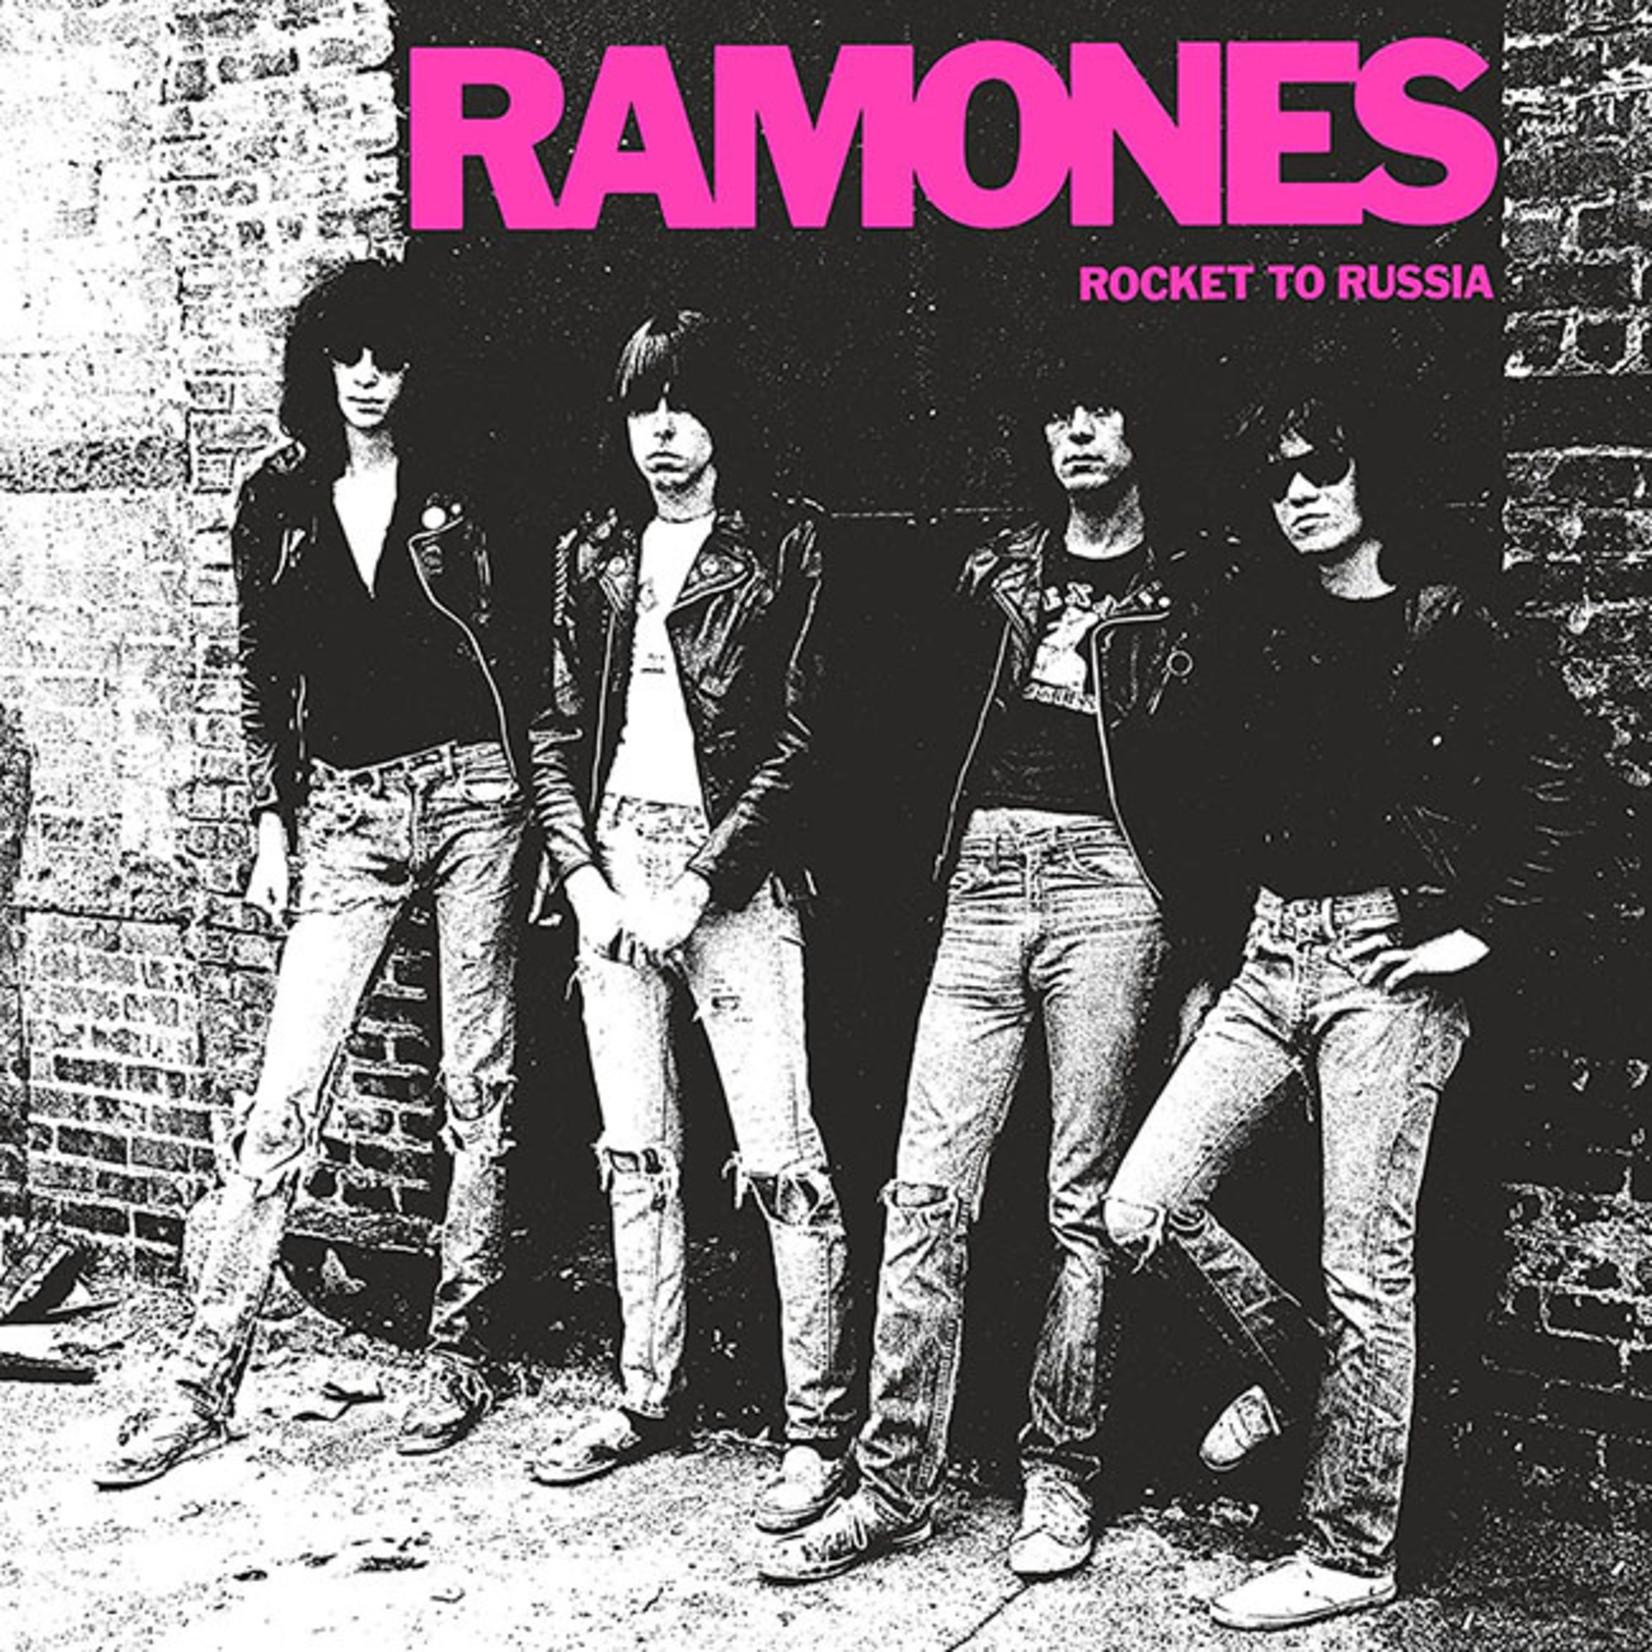 [New] Ramones: Rocket To Russia